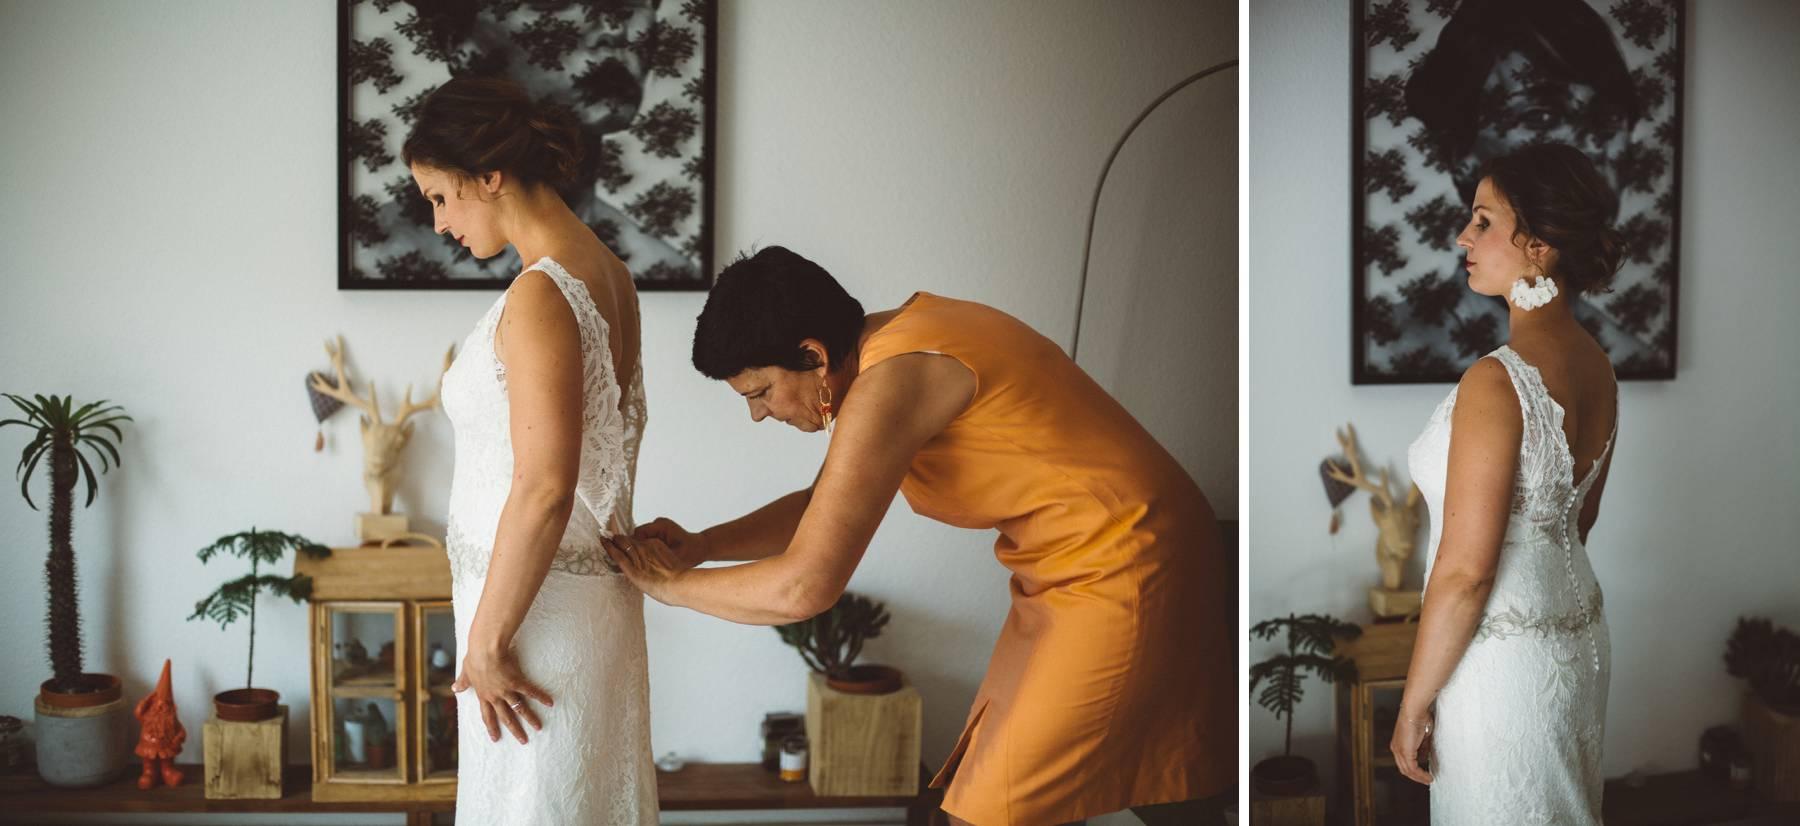 mariage-tropical-raben-horben_0003.jpg